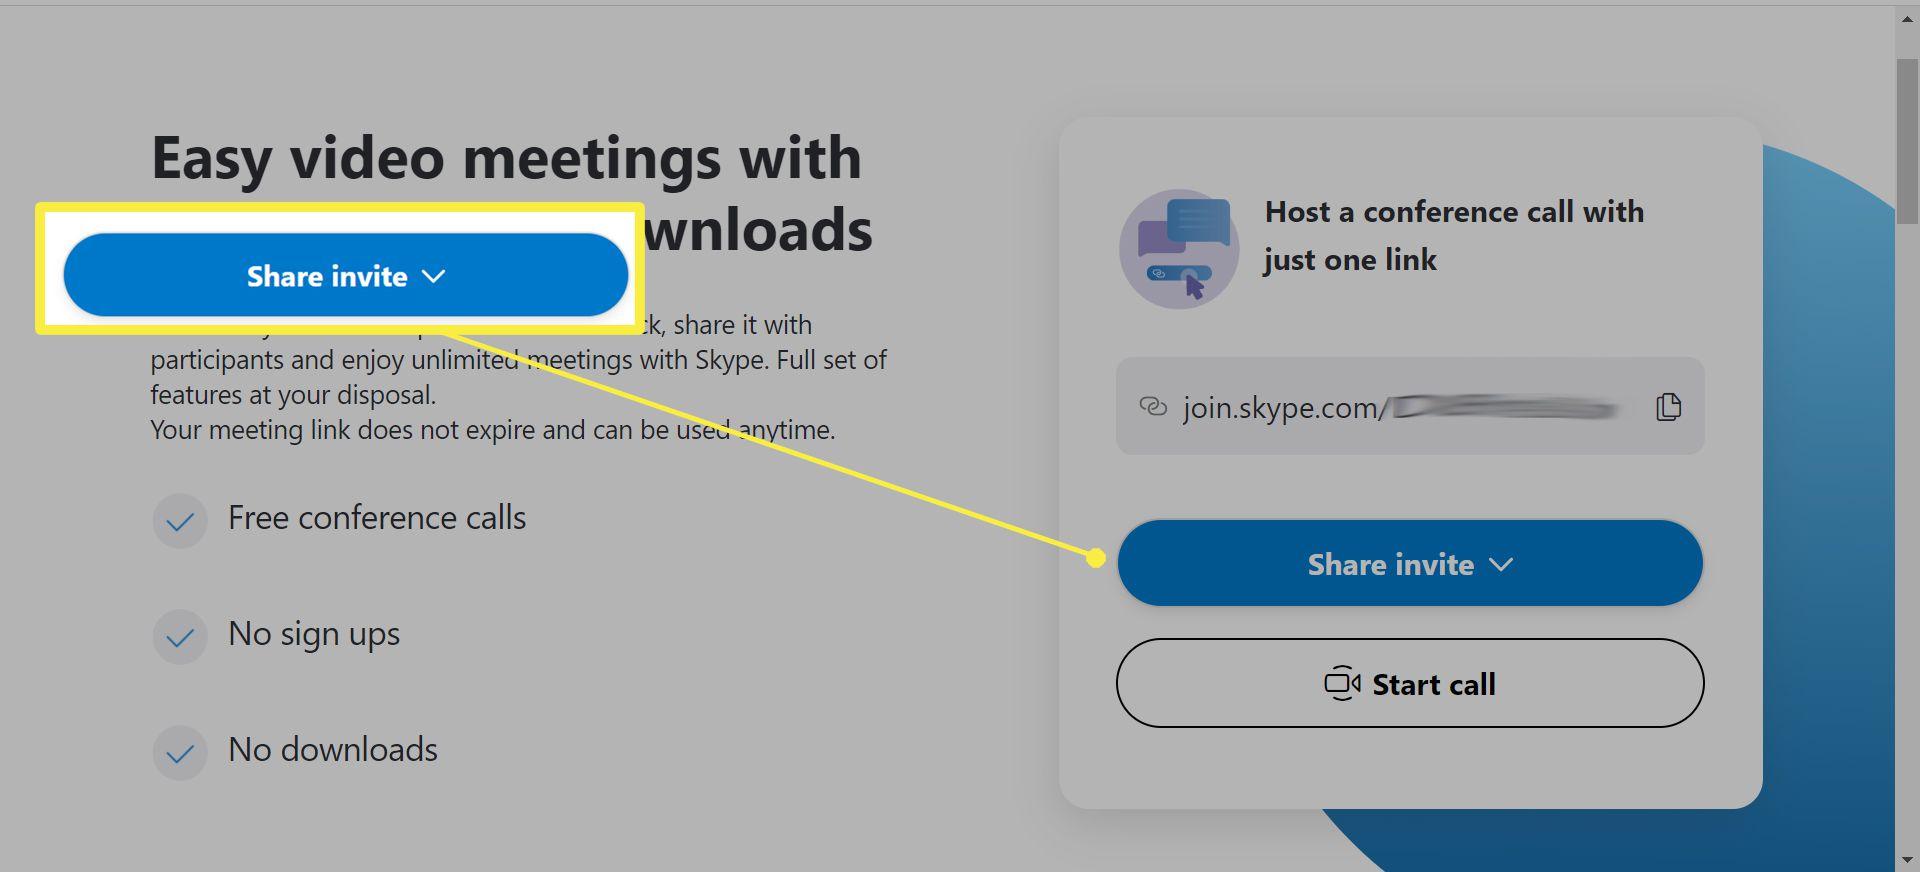 Using Skype Meet Now.